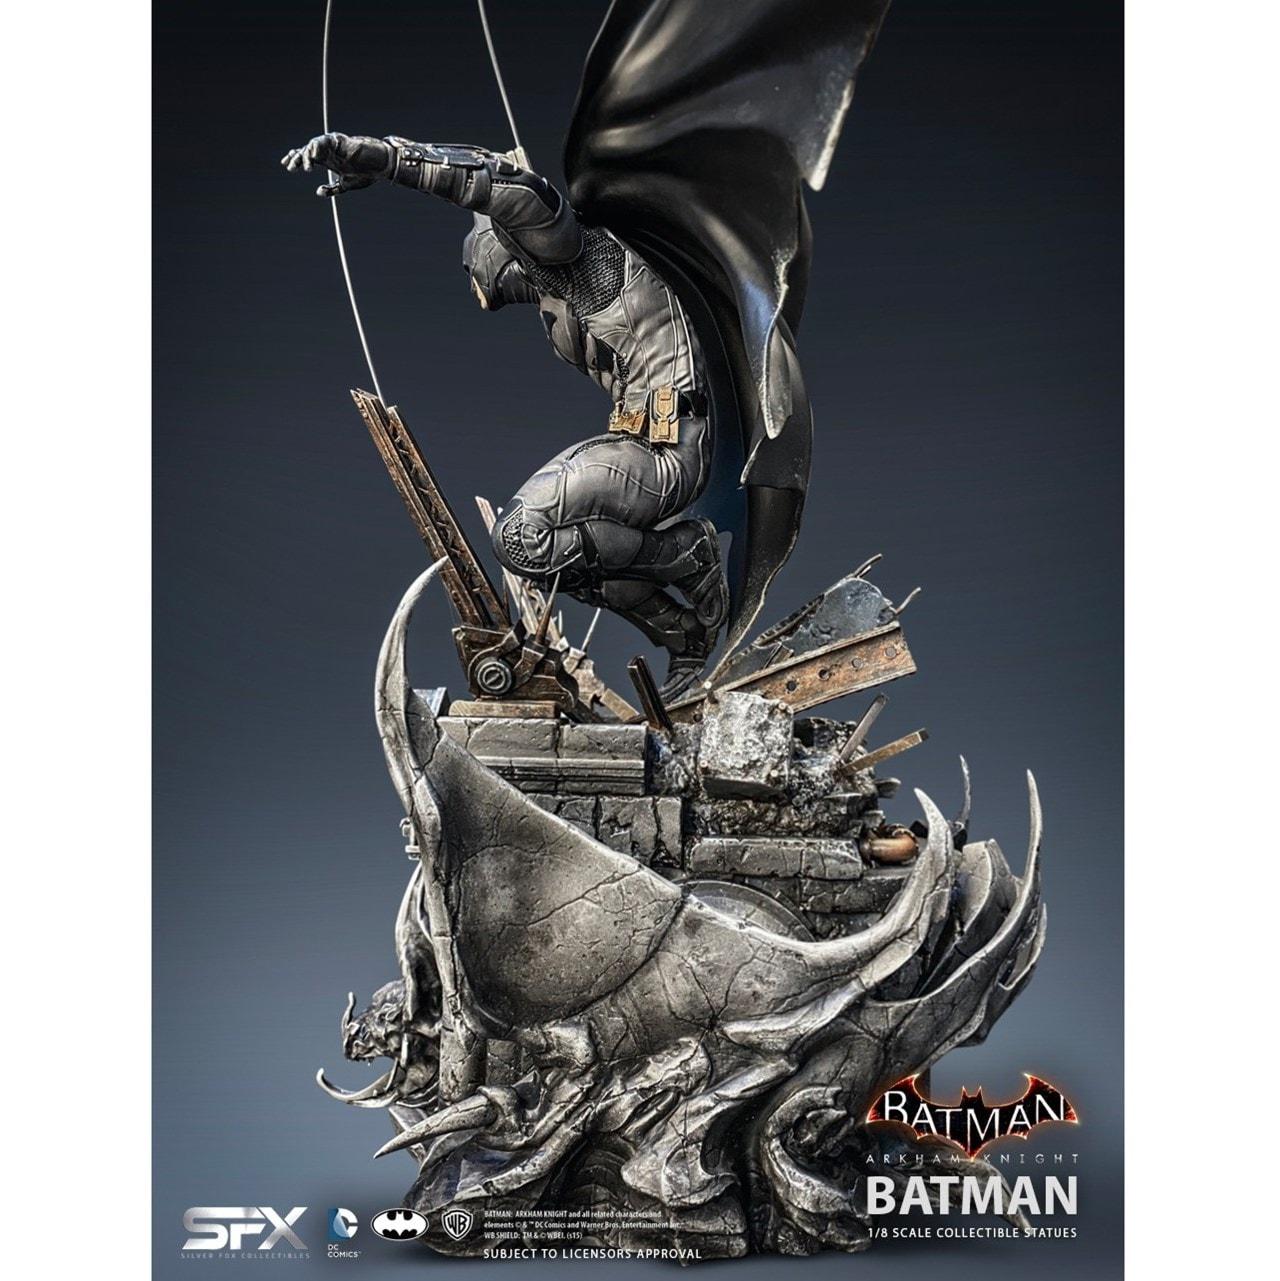 Batman: Arkham Knight Collectible Statue - 6